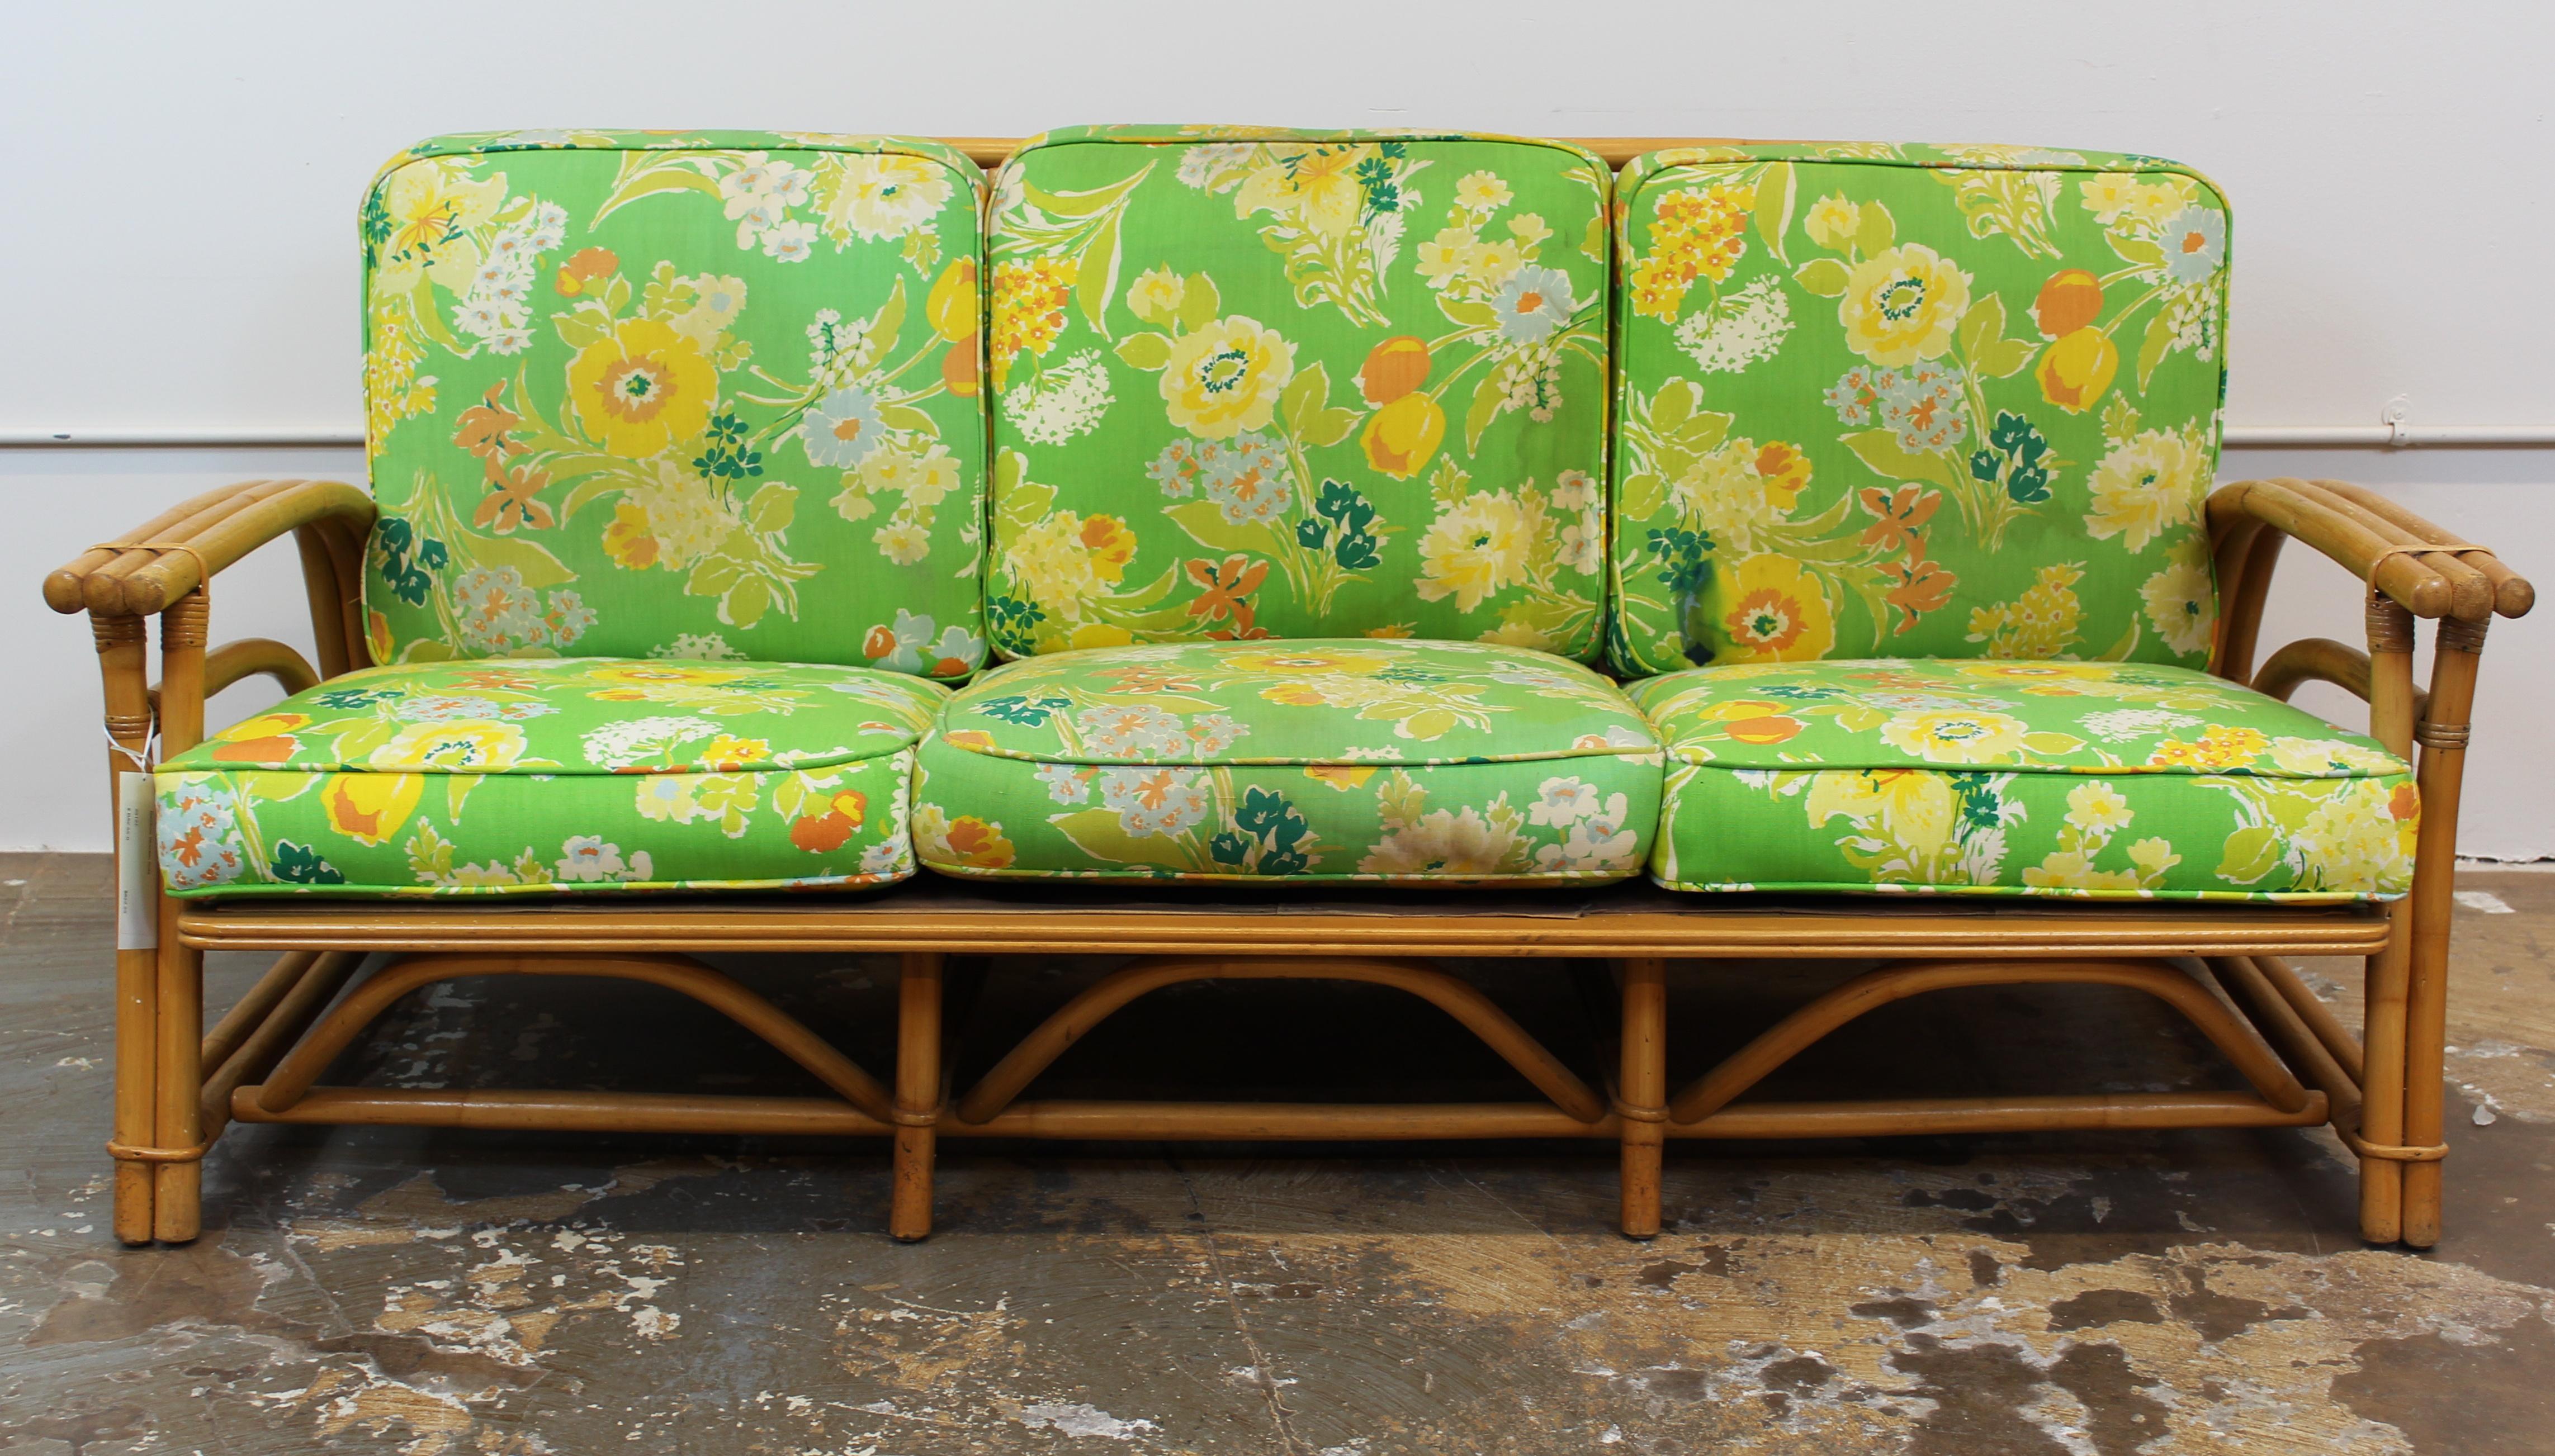 Midcentury Outdoor Bamboo Sofa